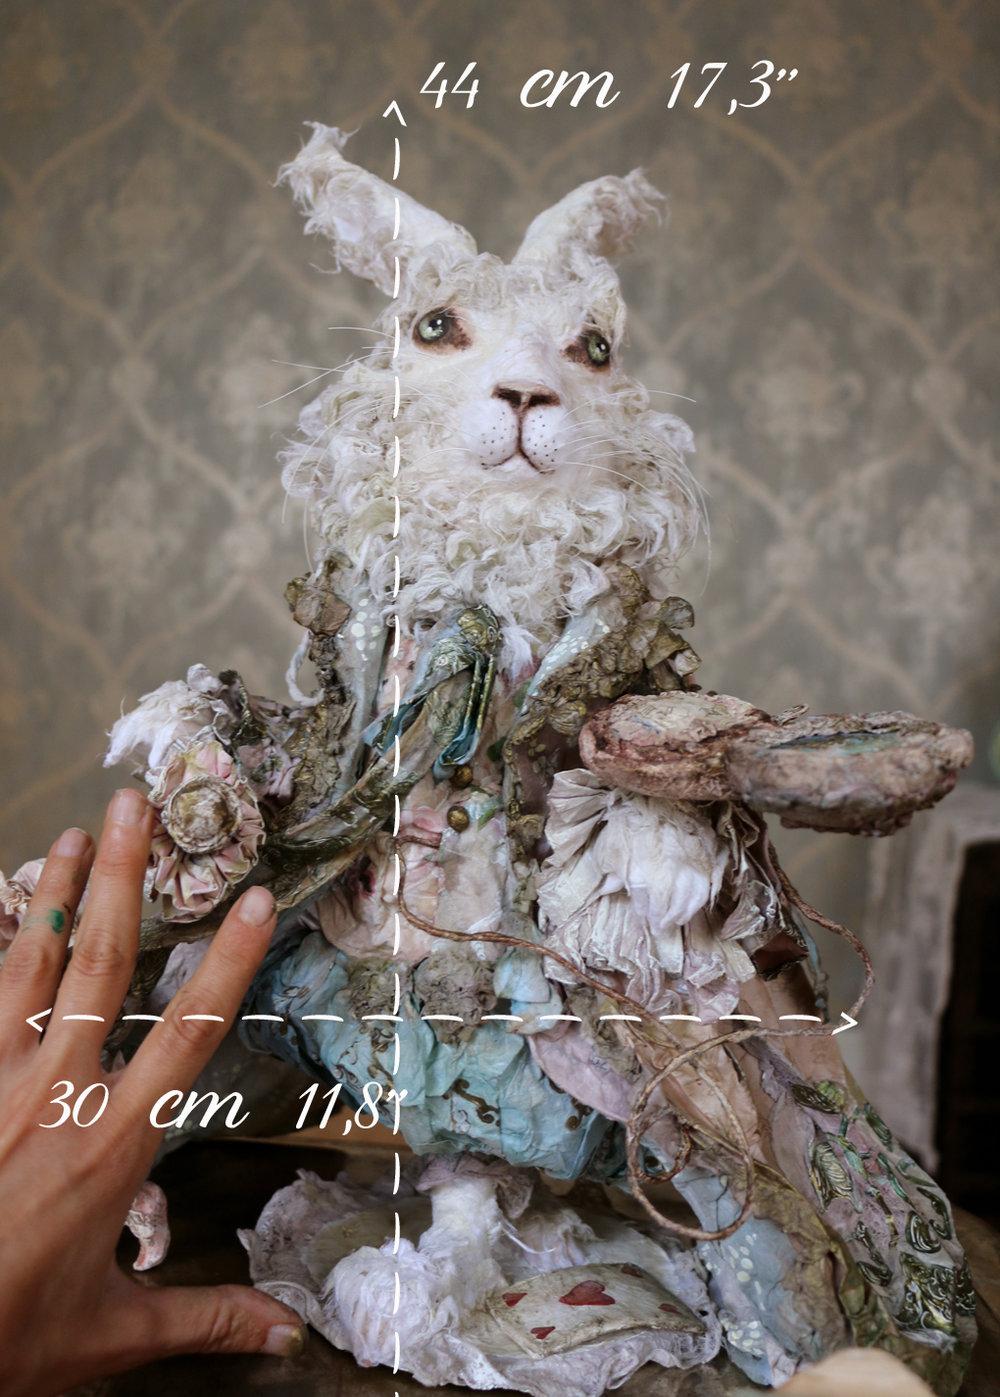 white-rabbit-measurements-8.jpg